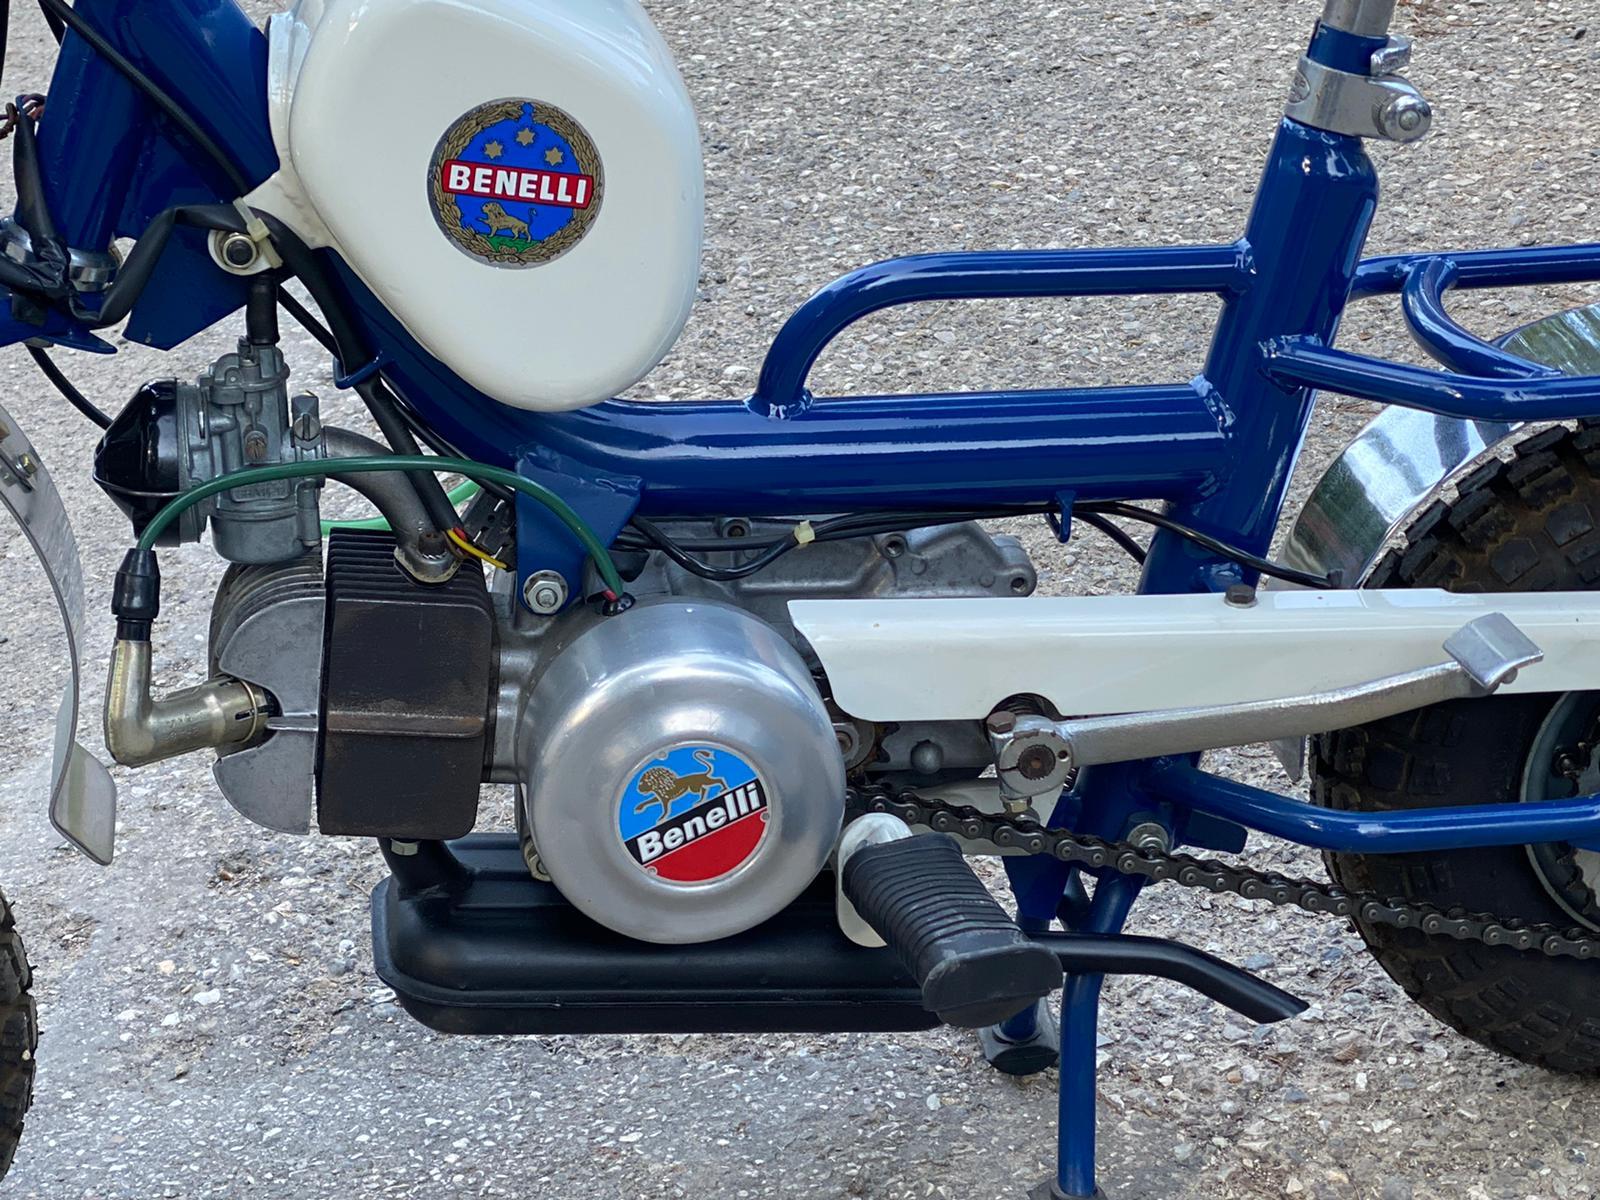 Benelli folding motorbike